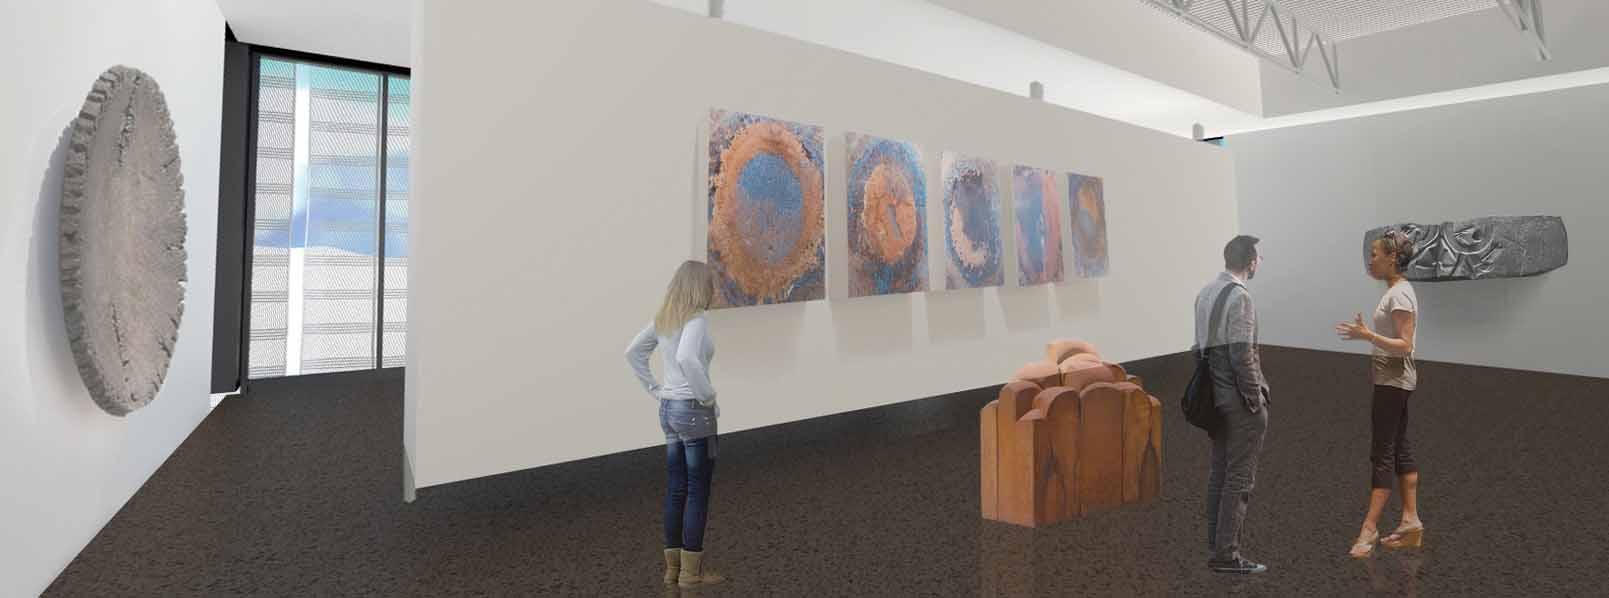 Upper Gallery5